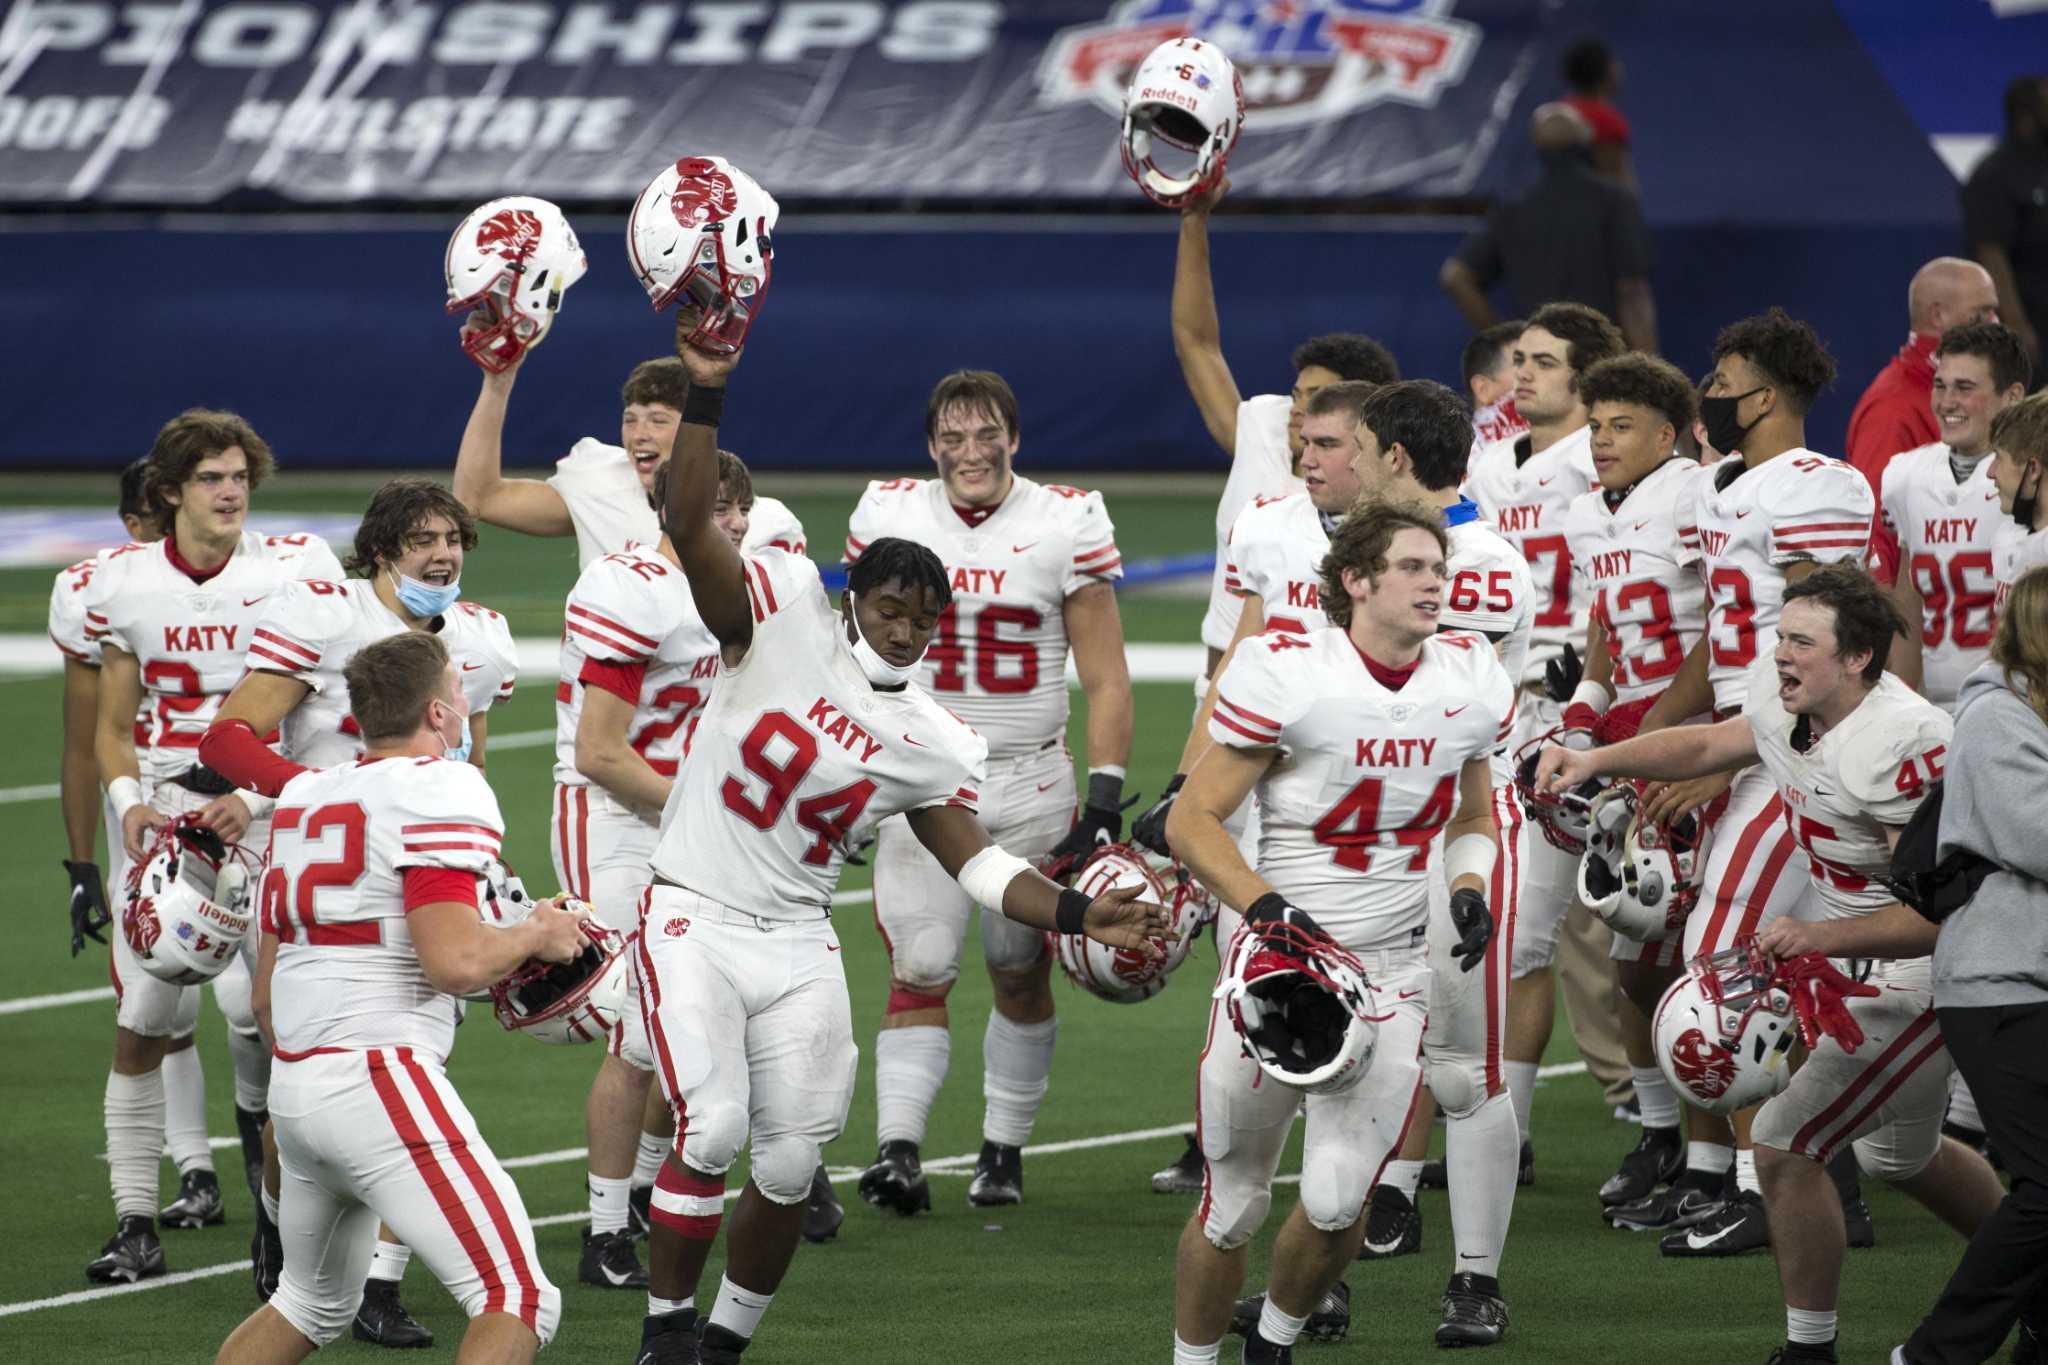 This high school football season won't soon be forgotten